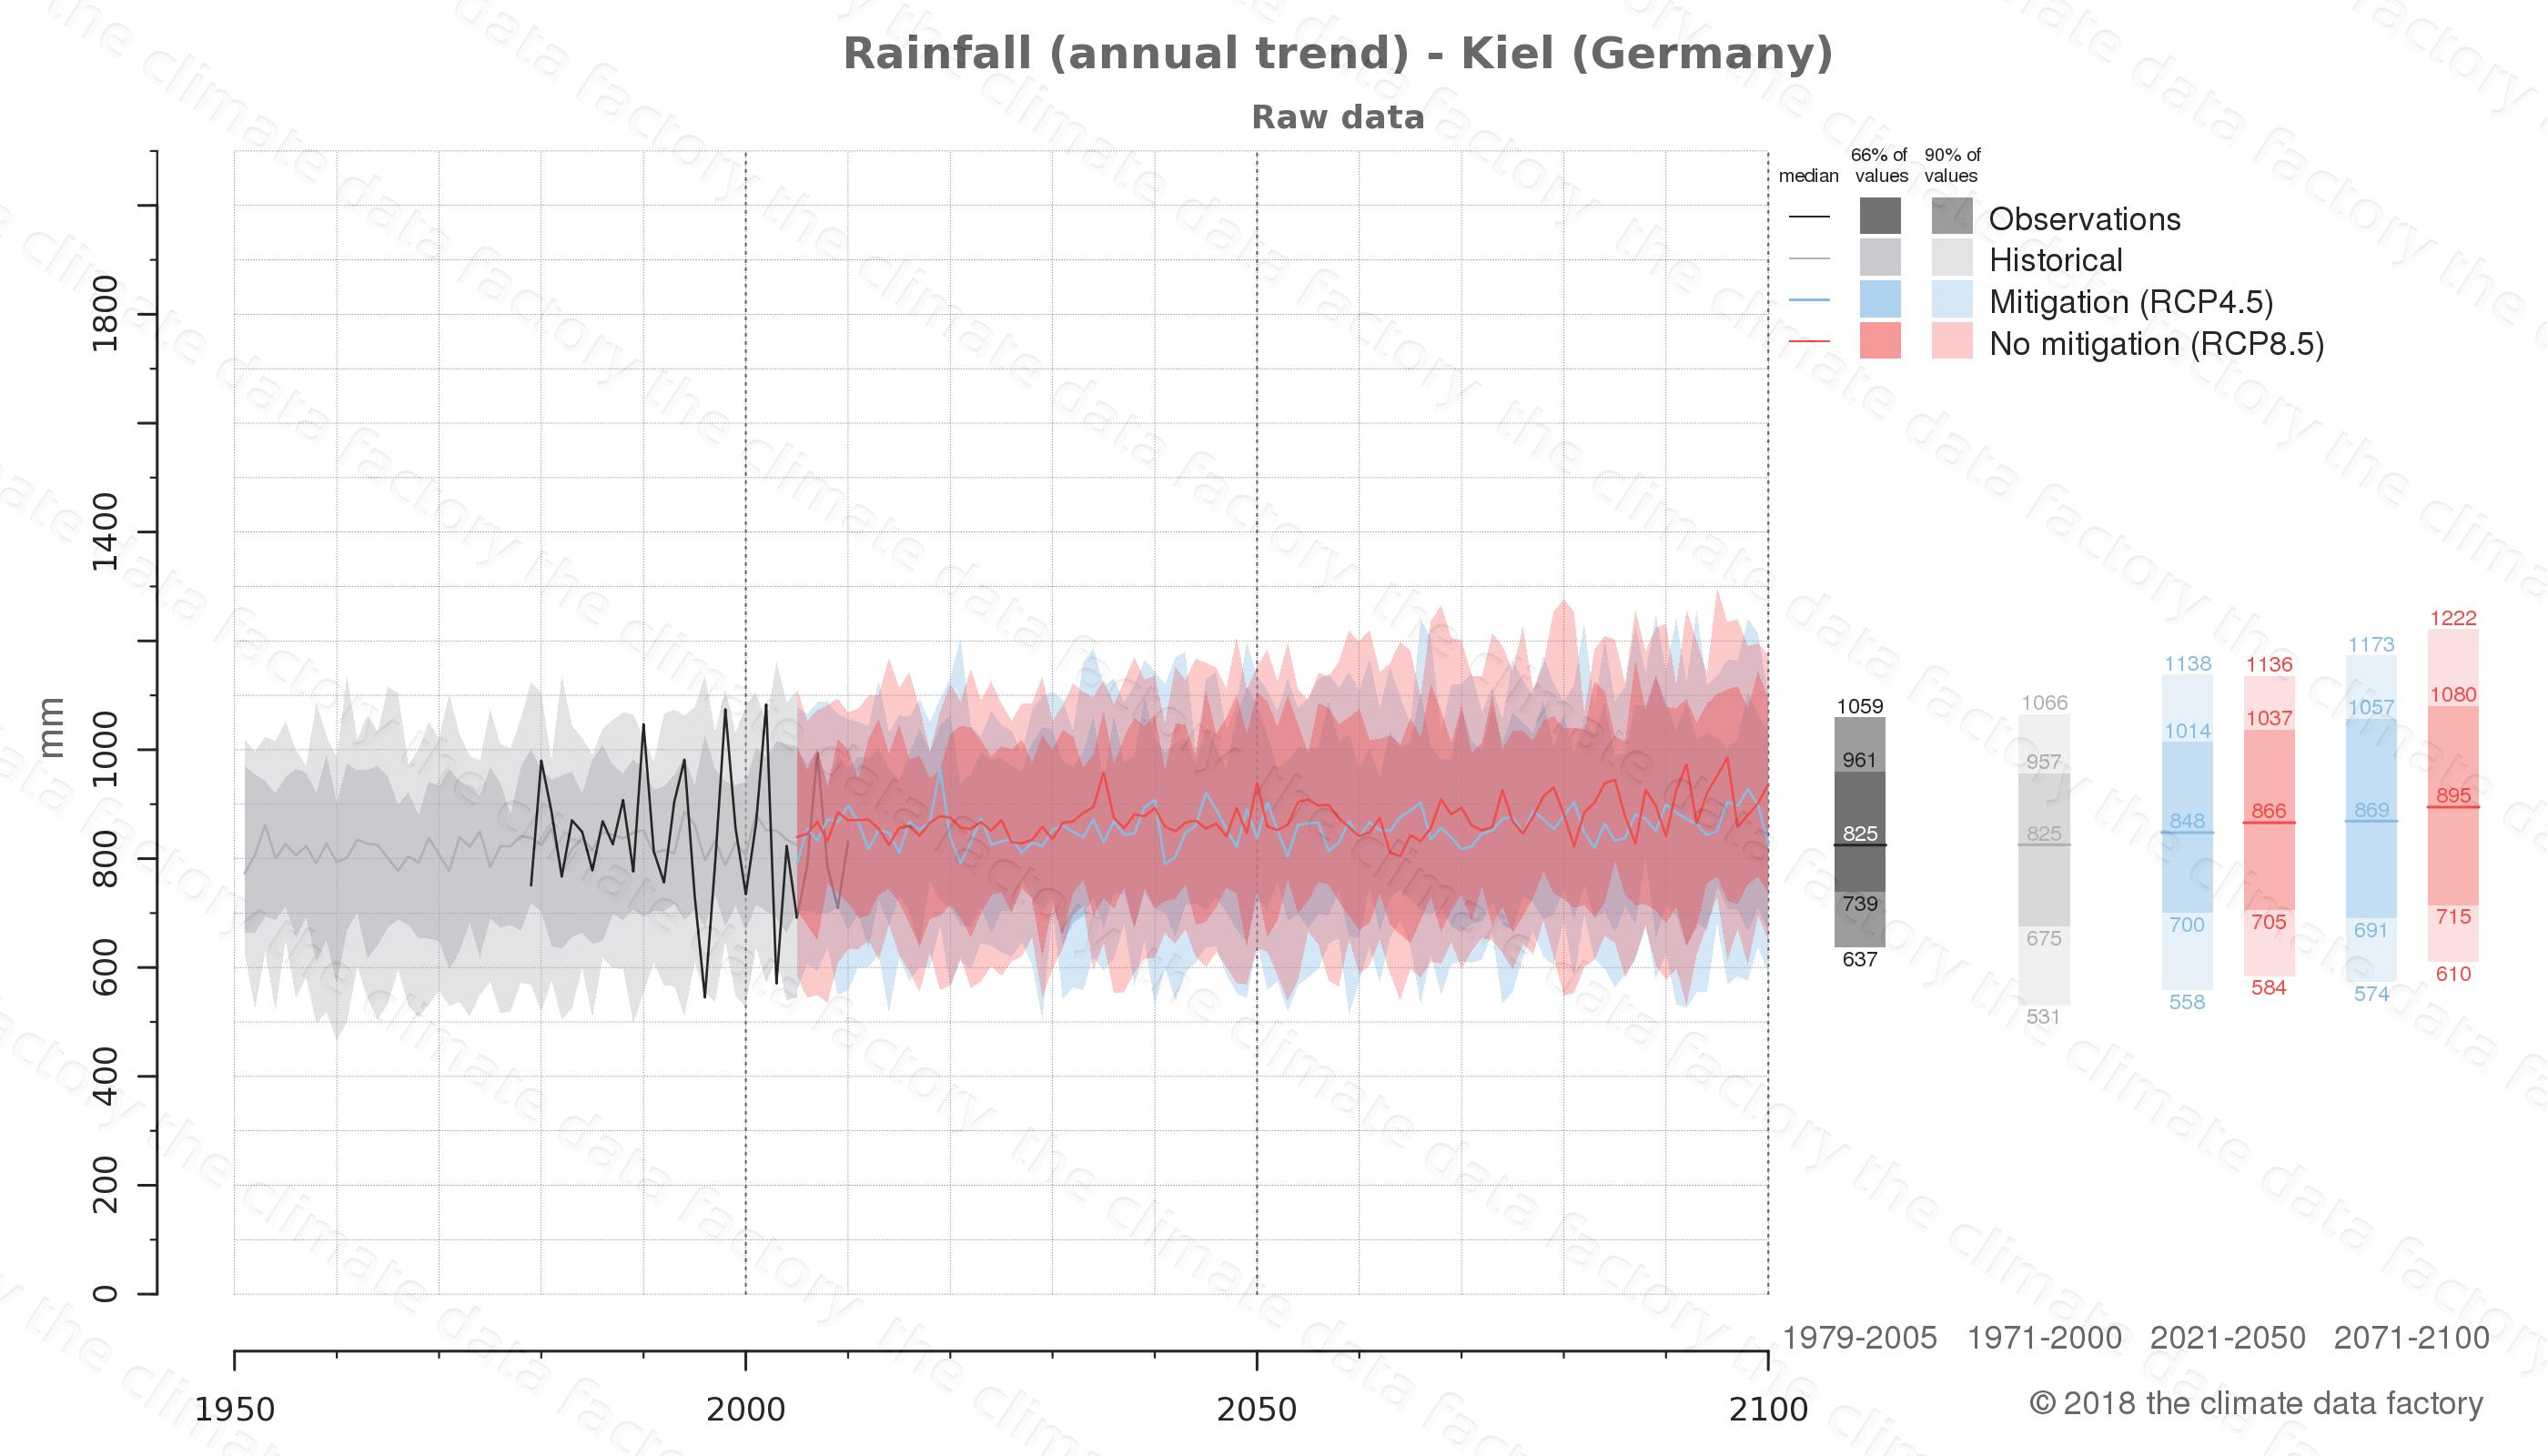 climate change data policy adaptation climate graph city data rainfall kiel germany